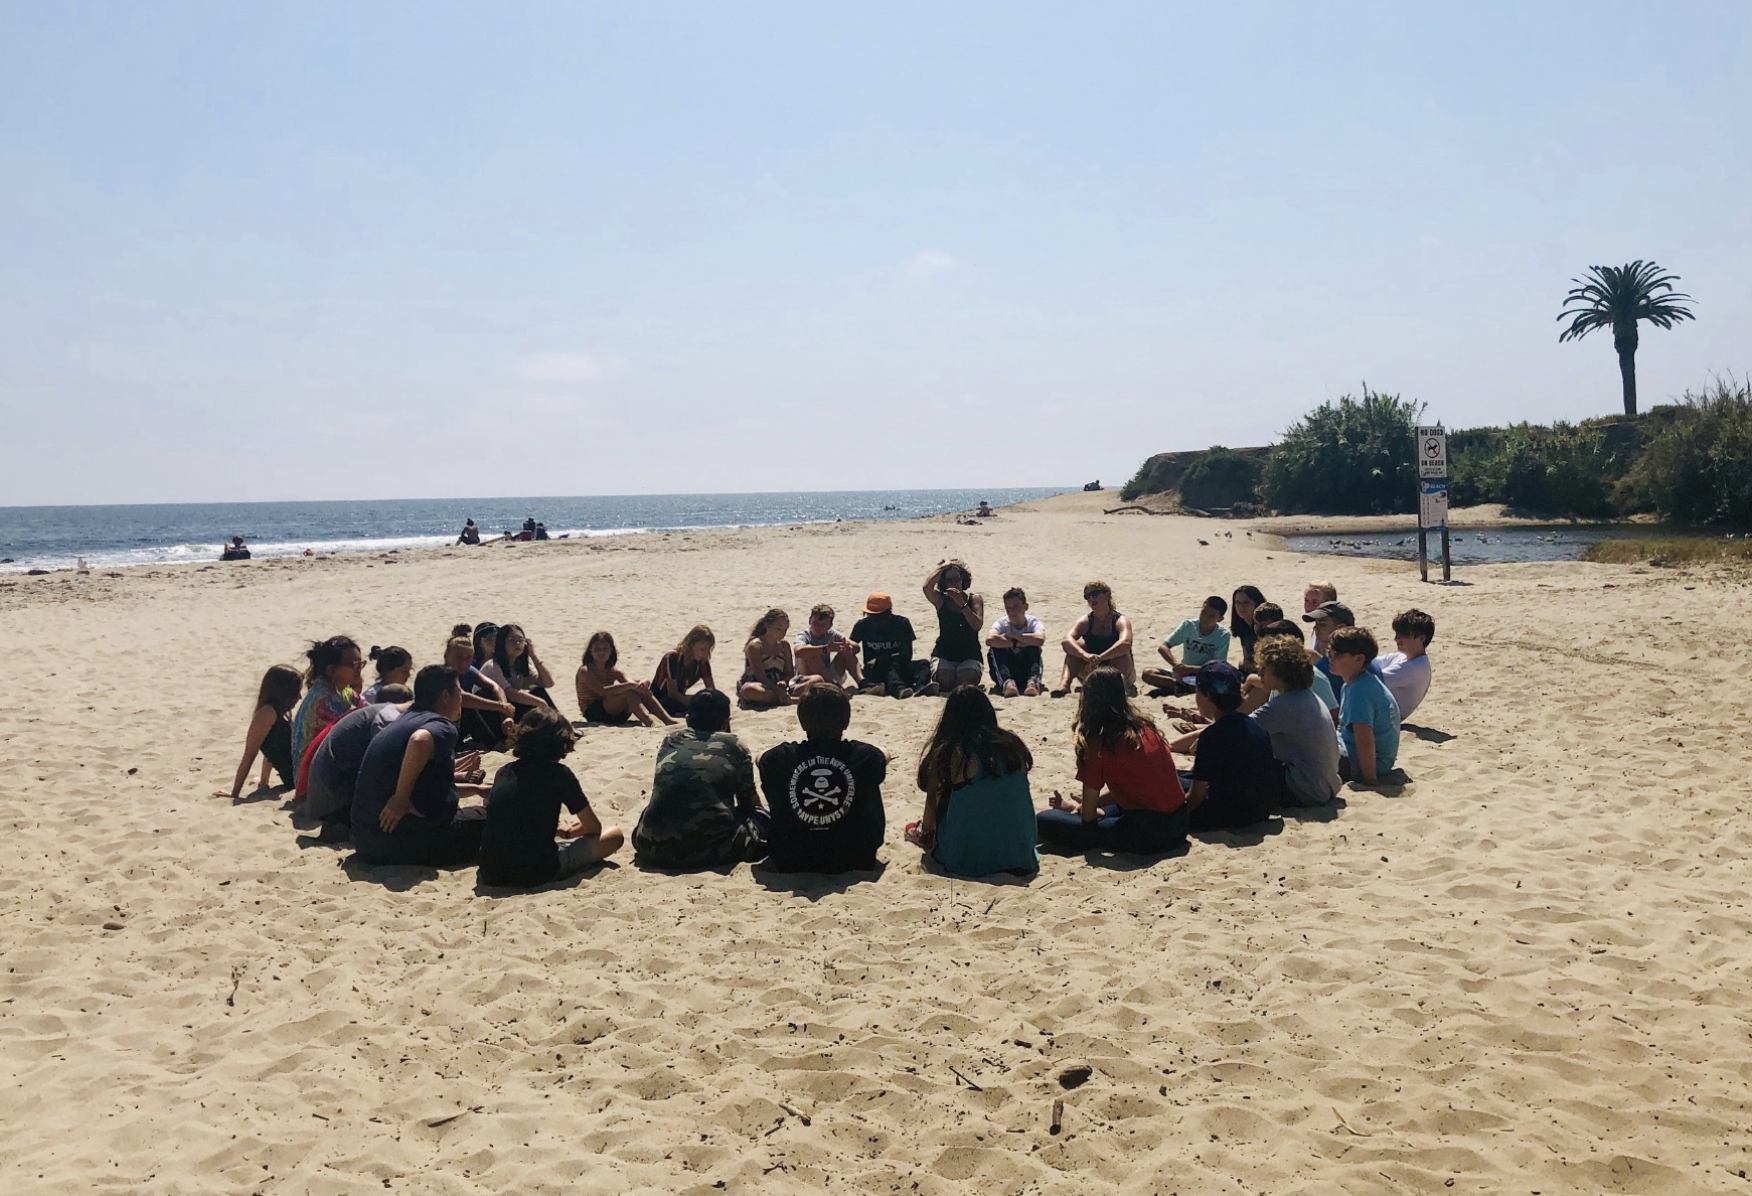 BEACH DAY 2019